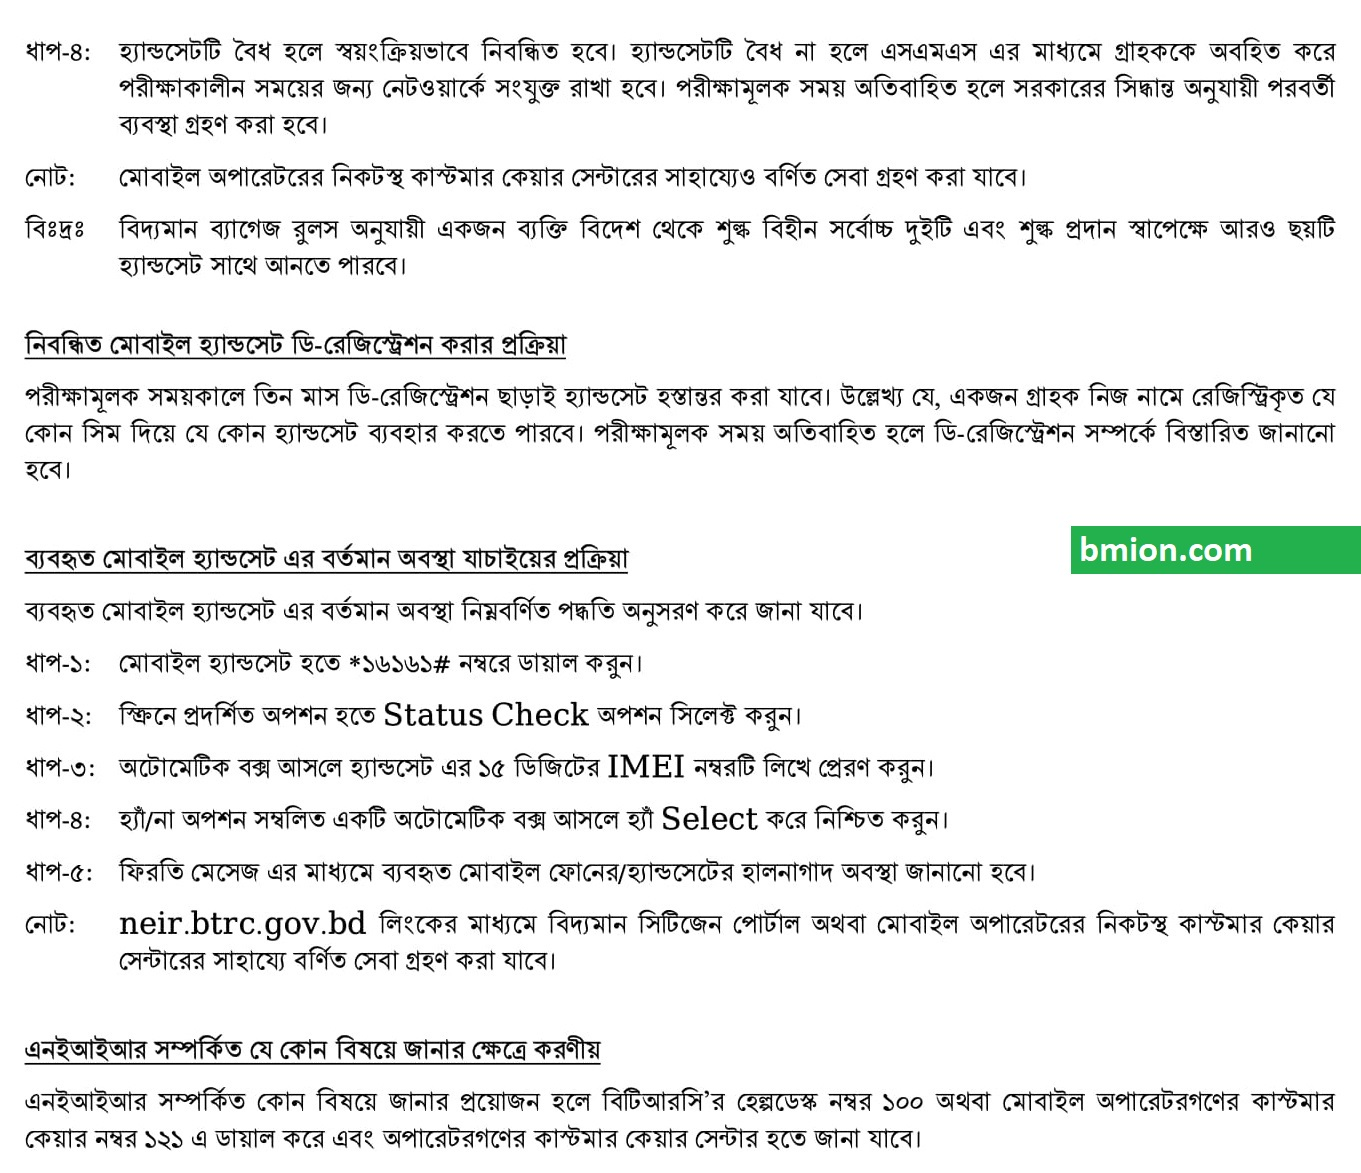 Mobile-IMEI-Registration-Bangladesh-Check-Valid-or-Invalid